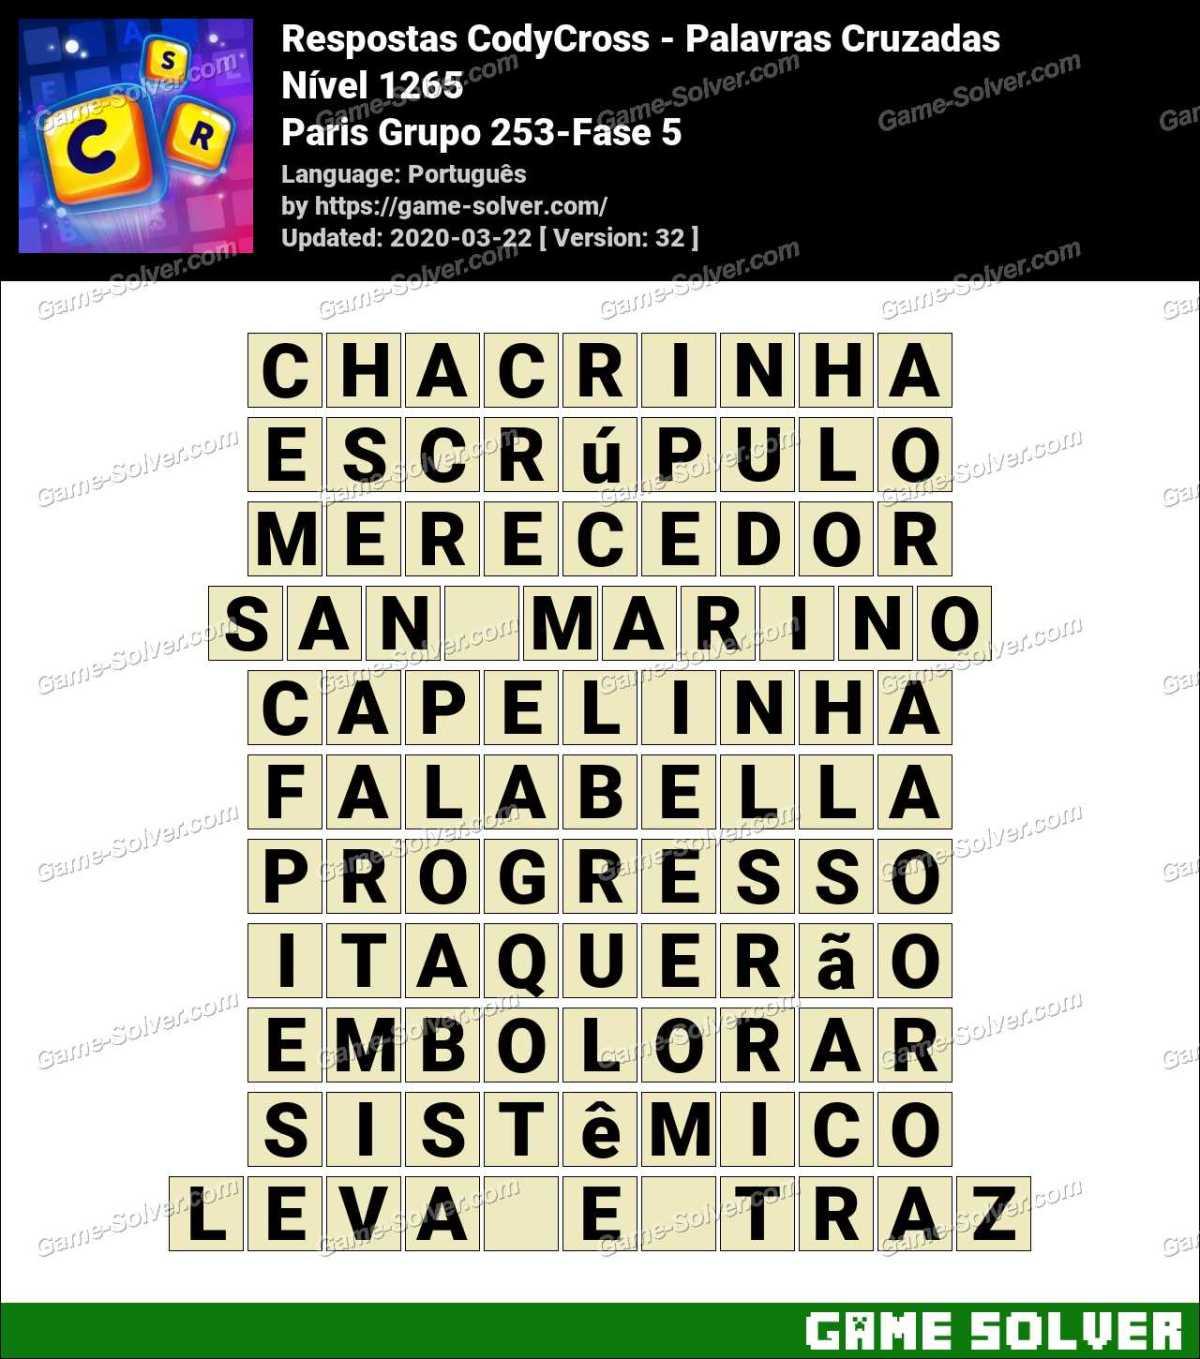 Respostas CodyCross Paris Grupo 253-Fase 5